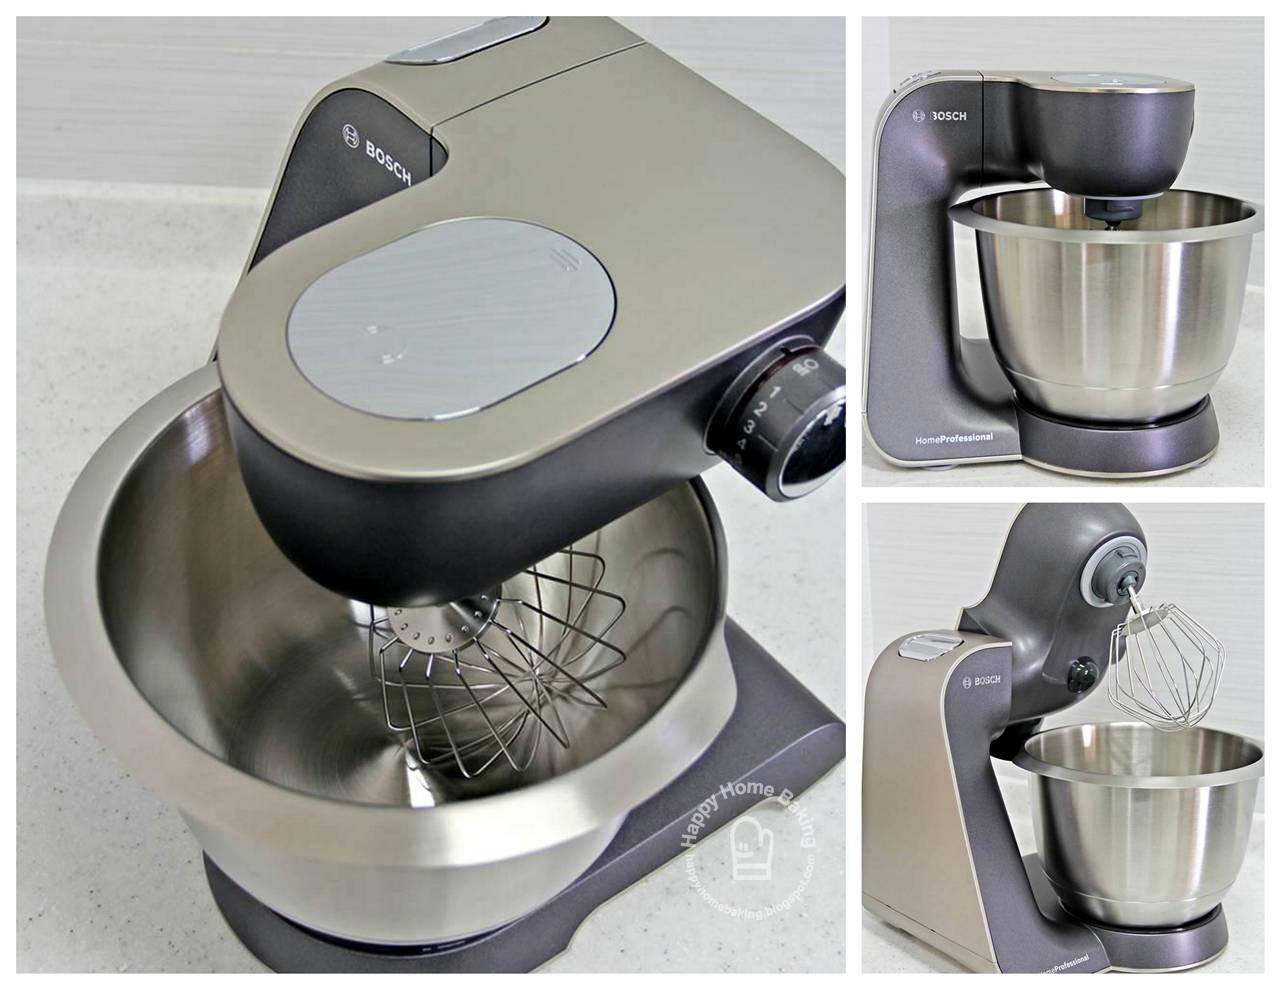 Bosch Kitchen Mixer Chinese Knife Happy Home Baking My New Helper